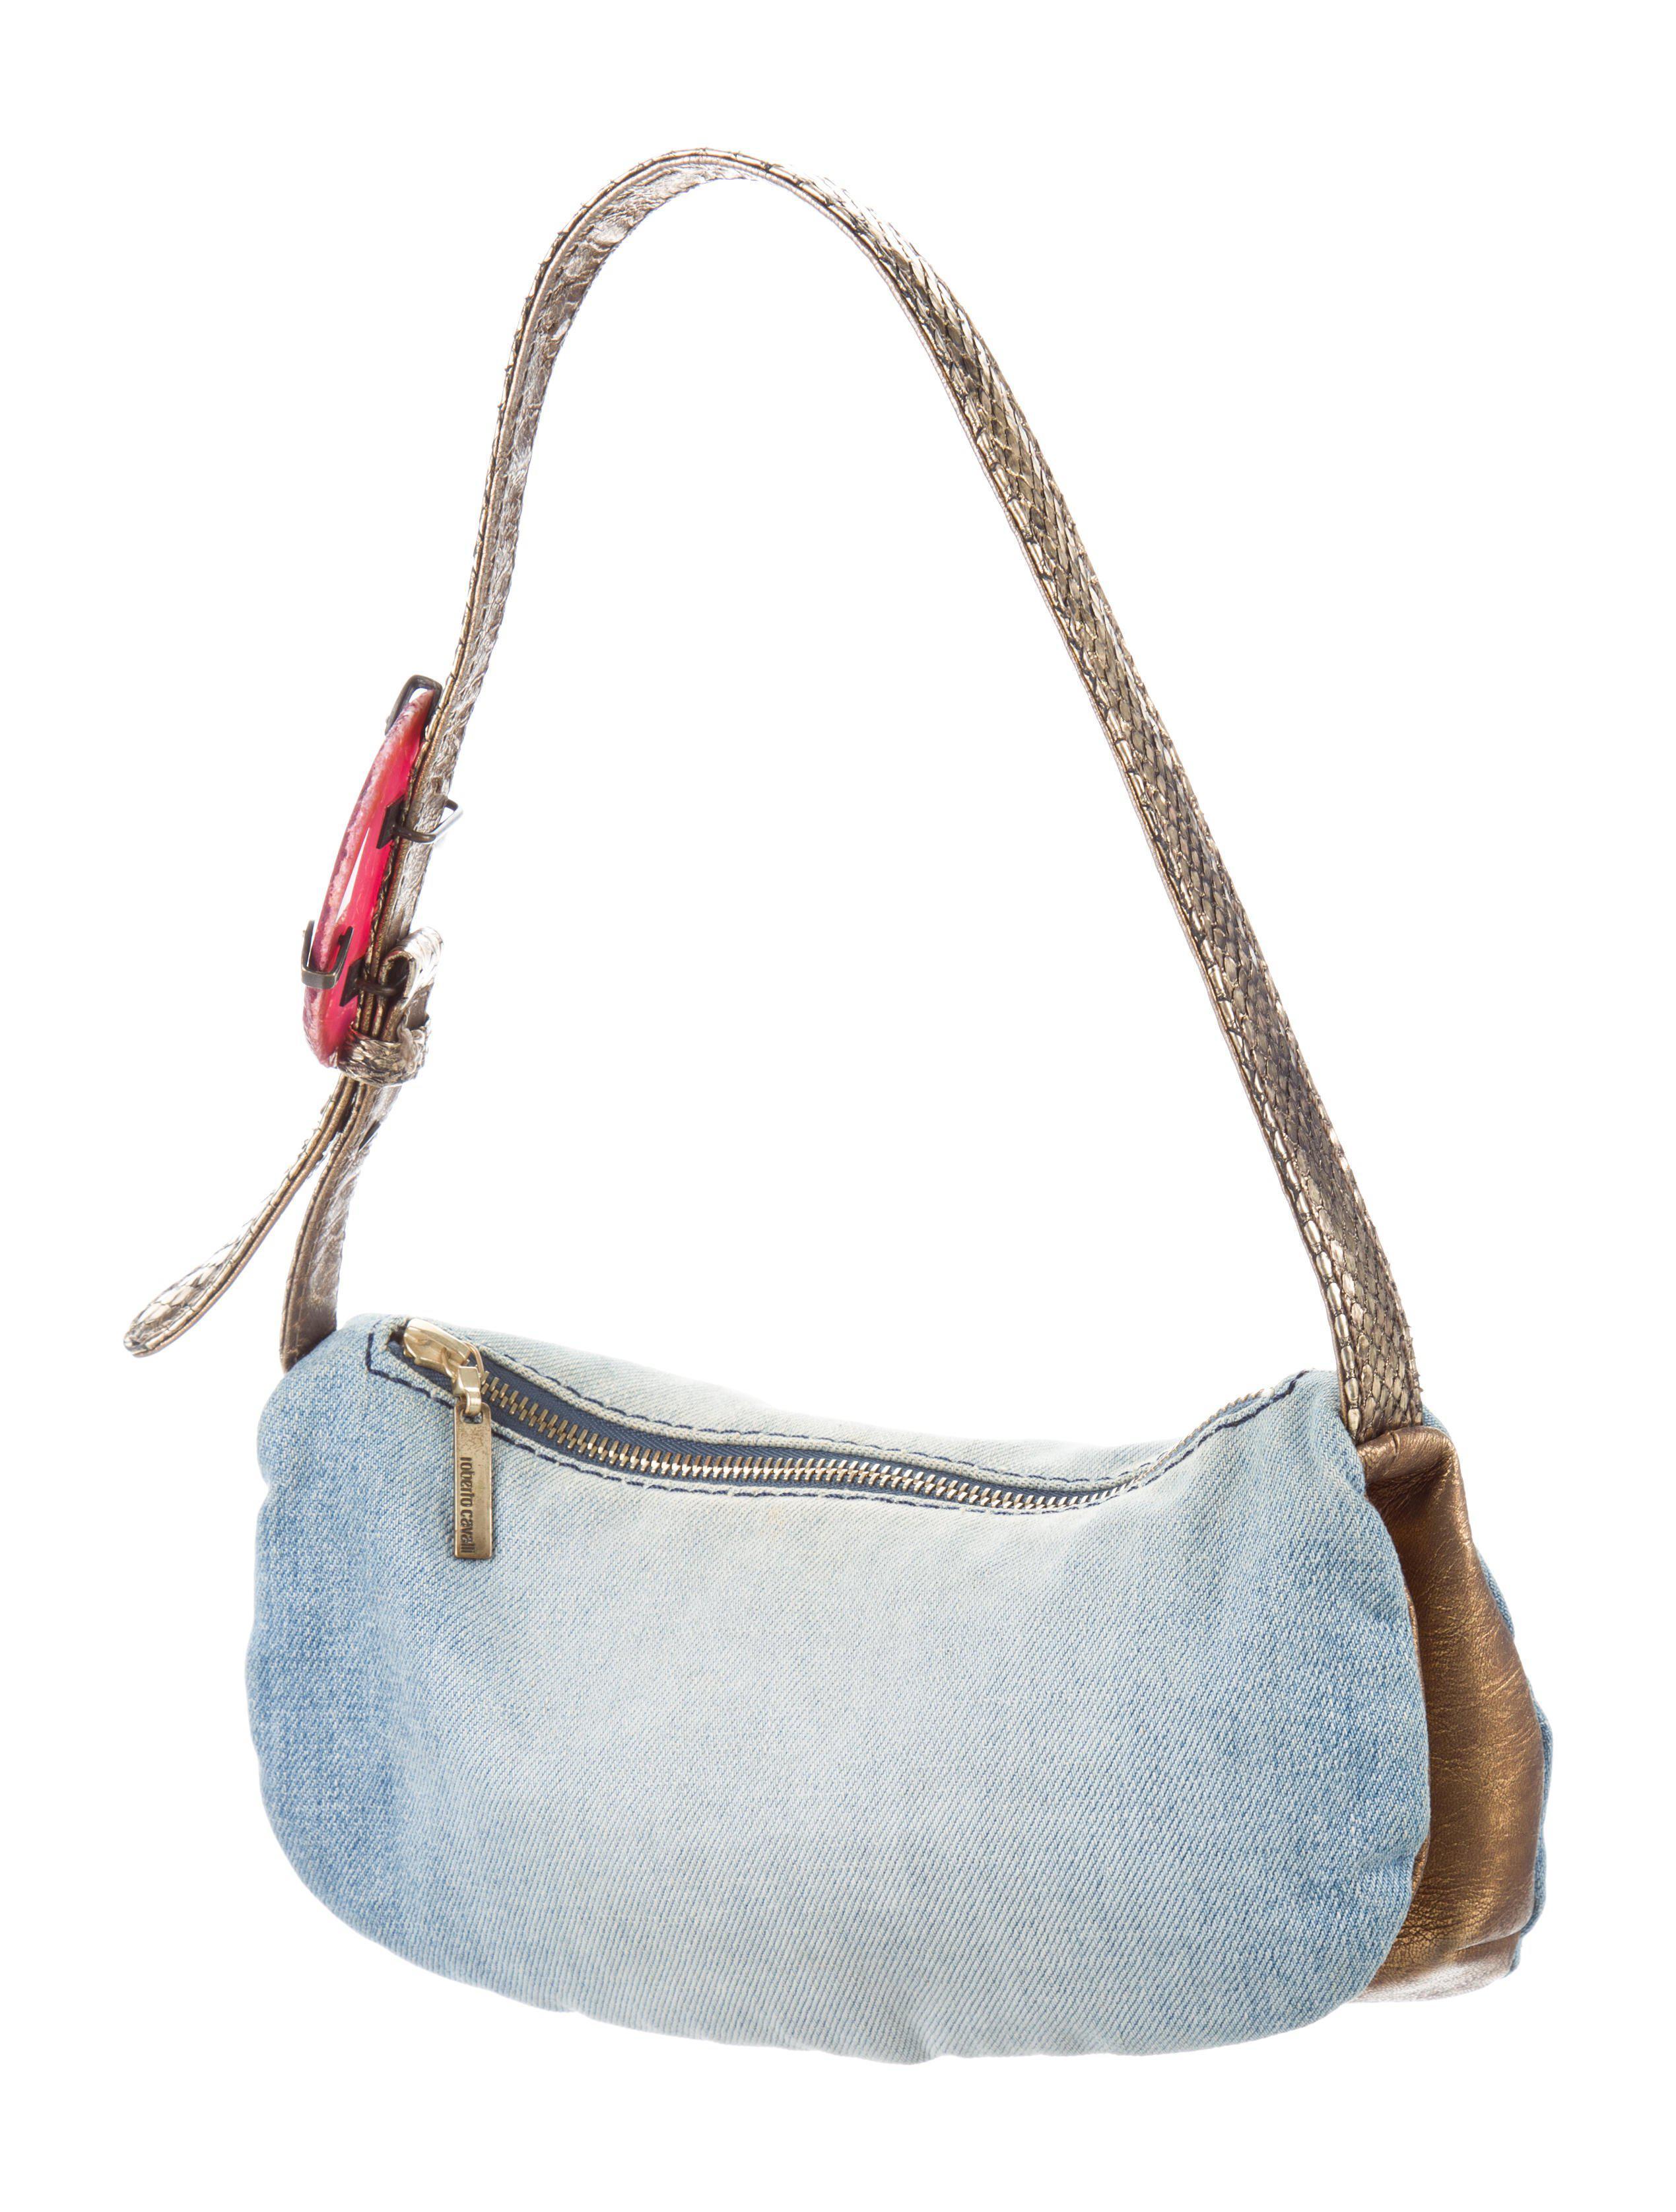 a311f5d95dd1 Lyst - Roberto Cavalli Snakeskin-trimmed Shoulder Bag Blue in Metallic